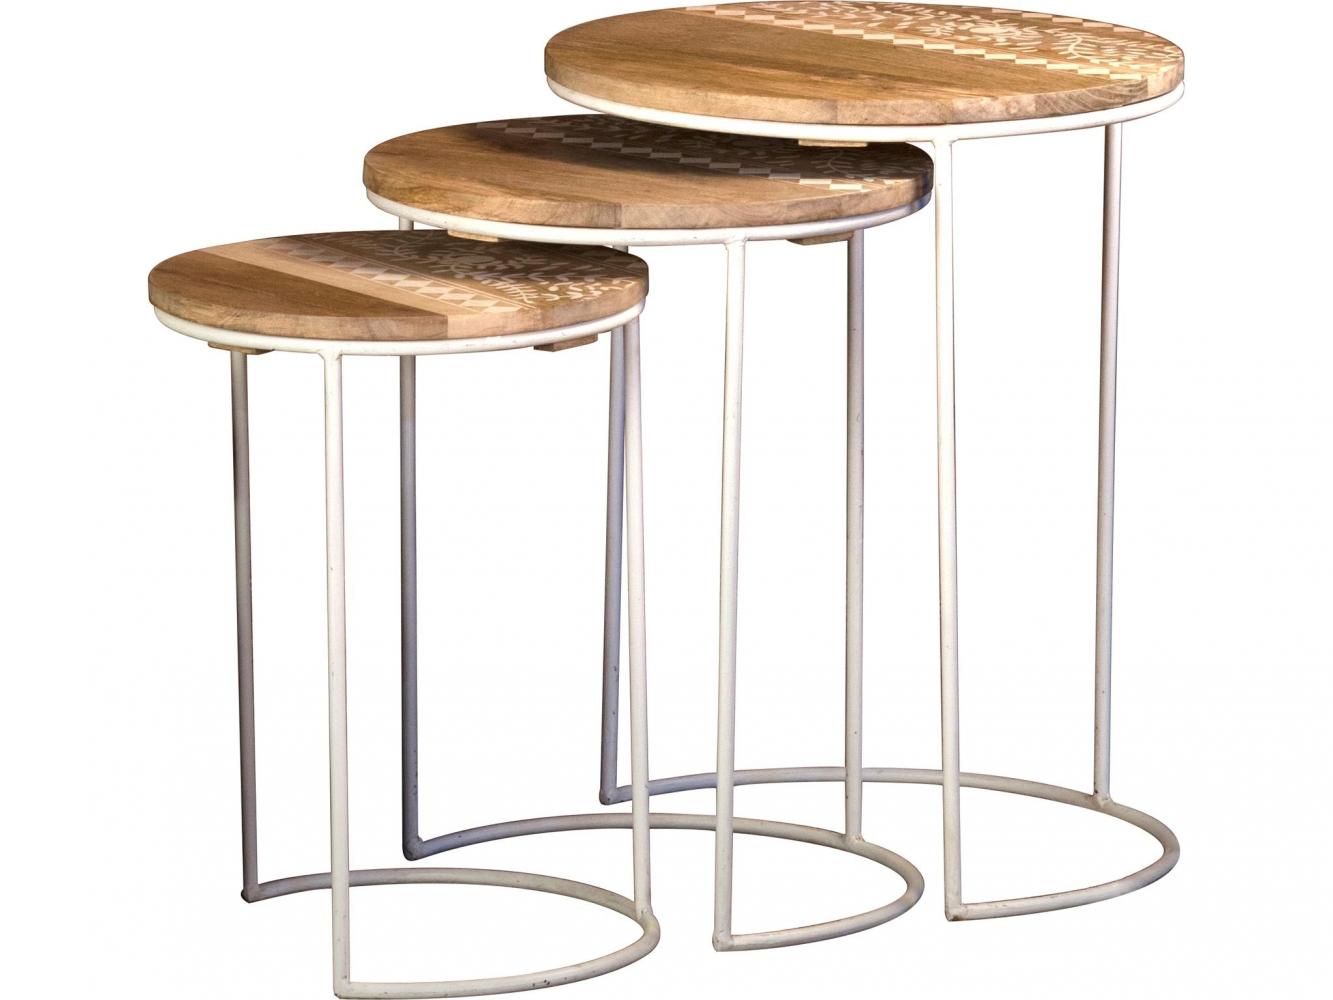 Odkládací stolek Sophi (SADA 3 ks), 45 cm, hnědá / bílá